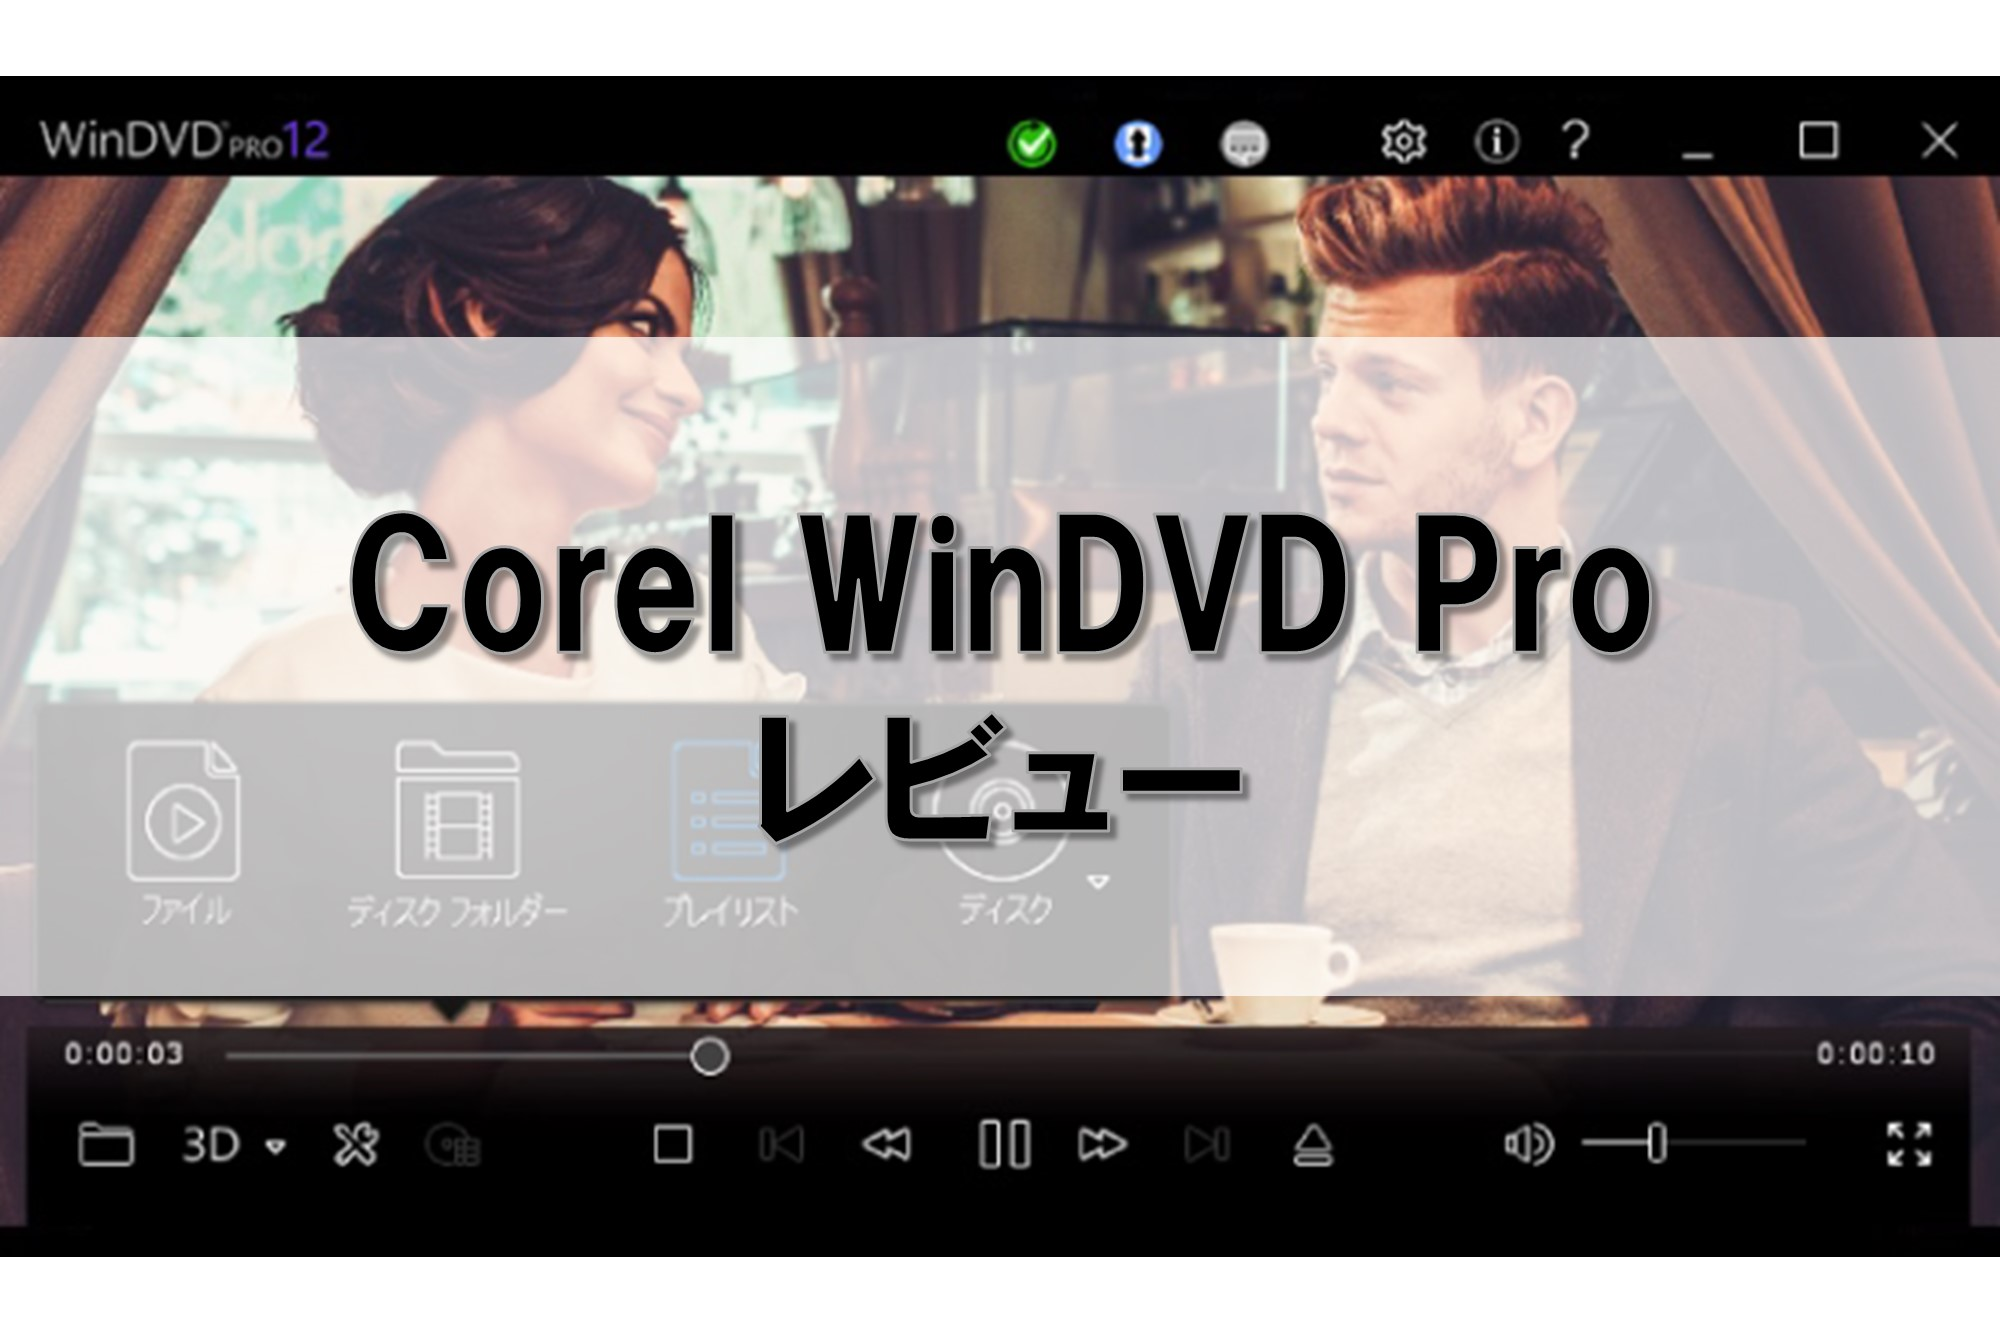 Corel WinDVD Pro レビュー